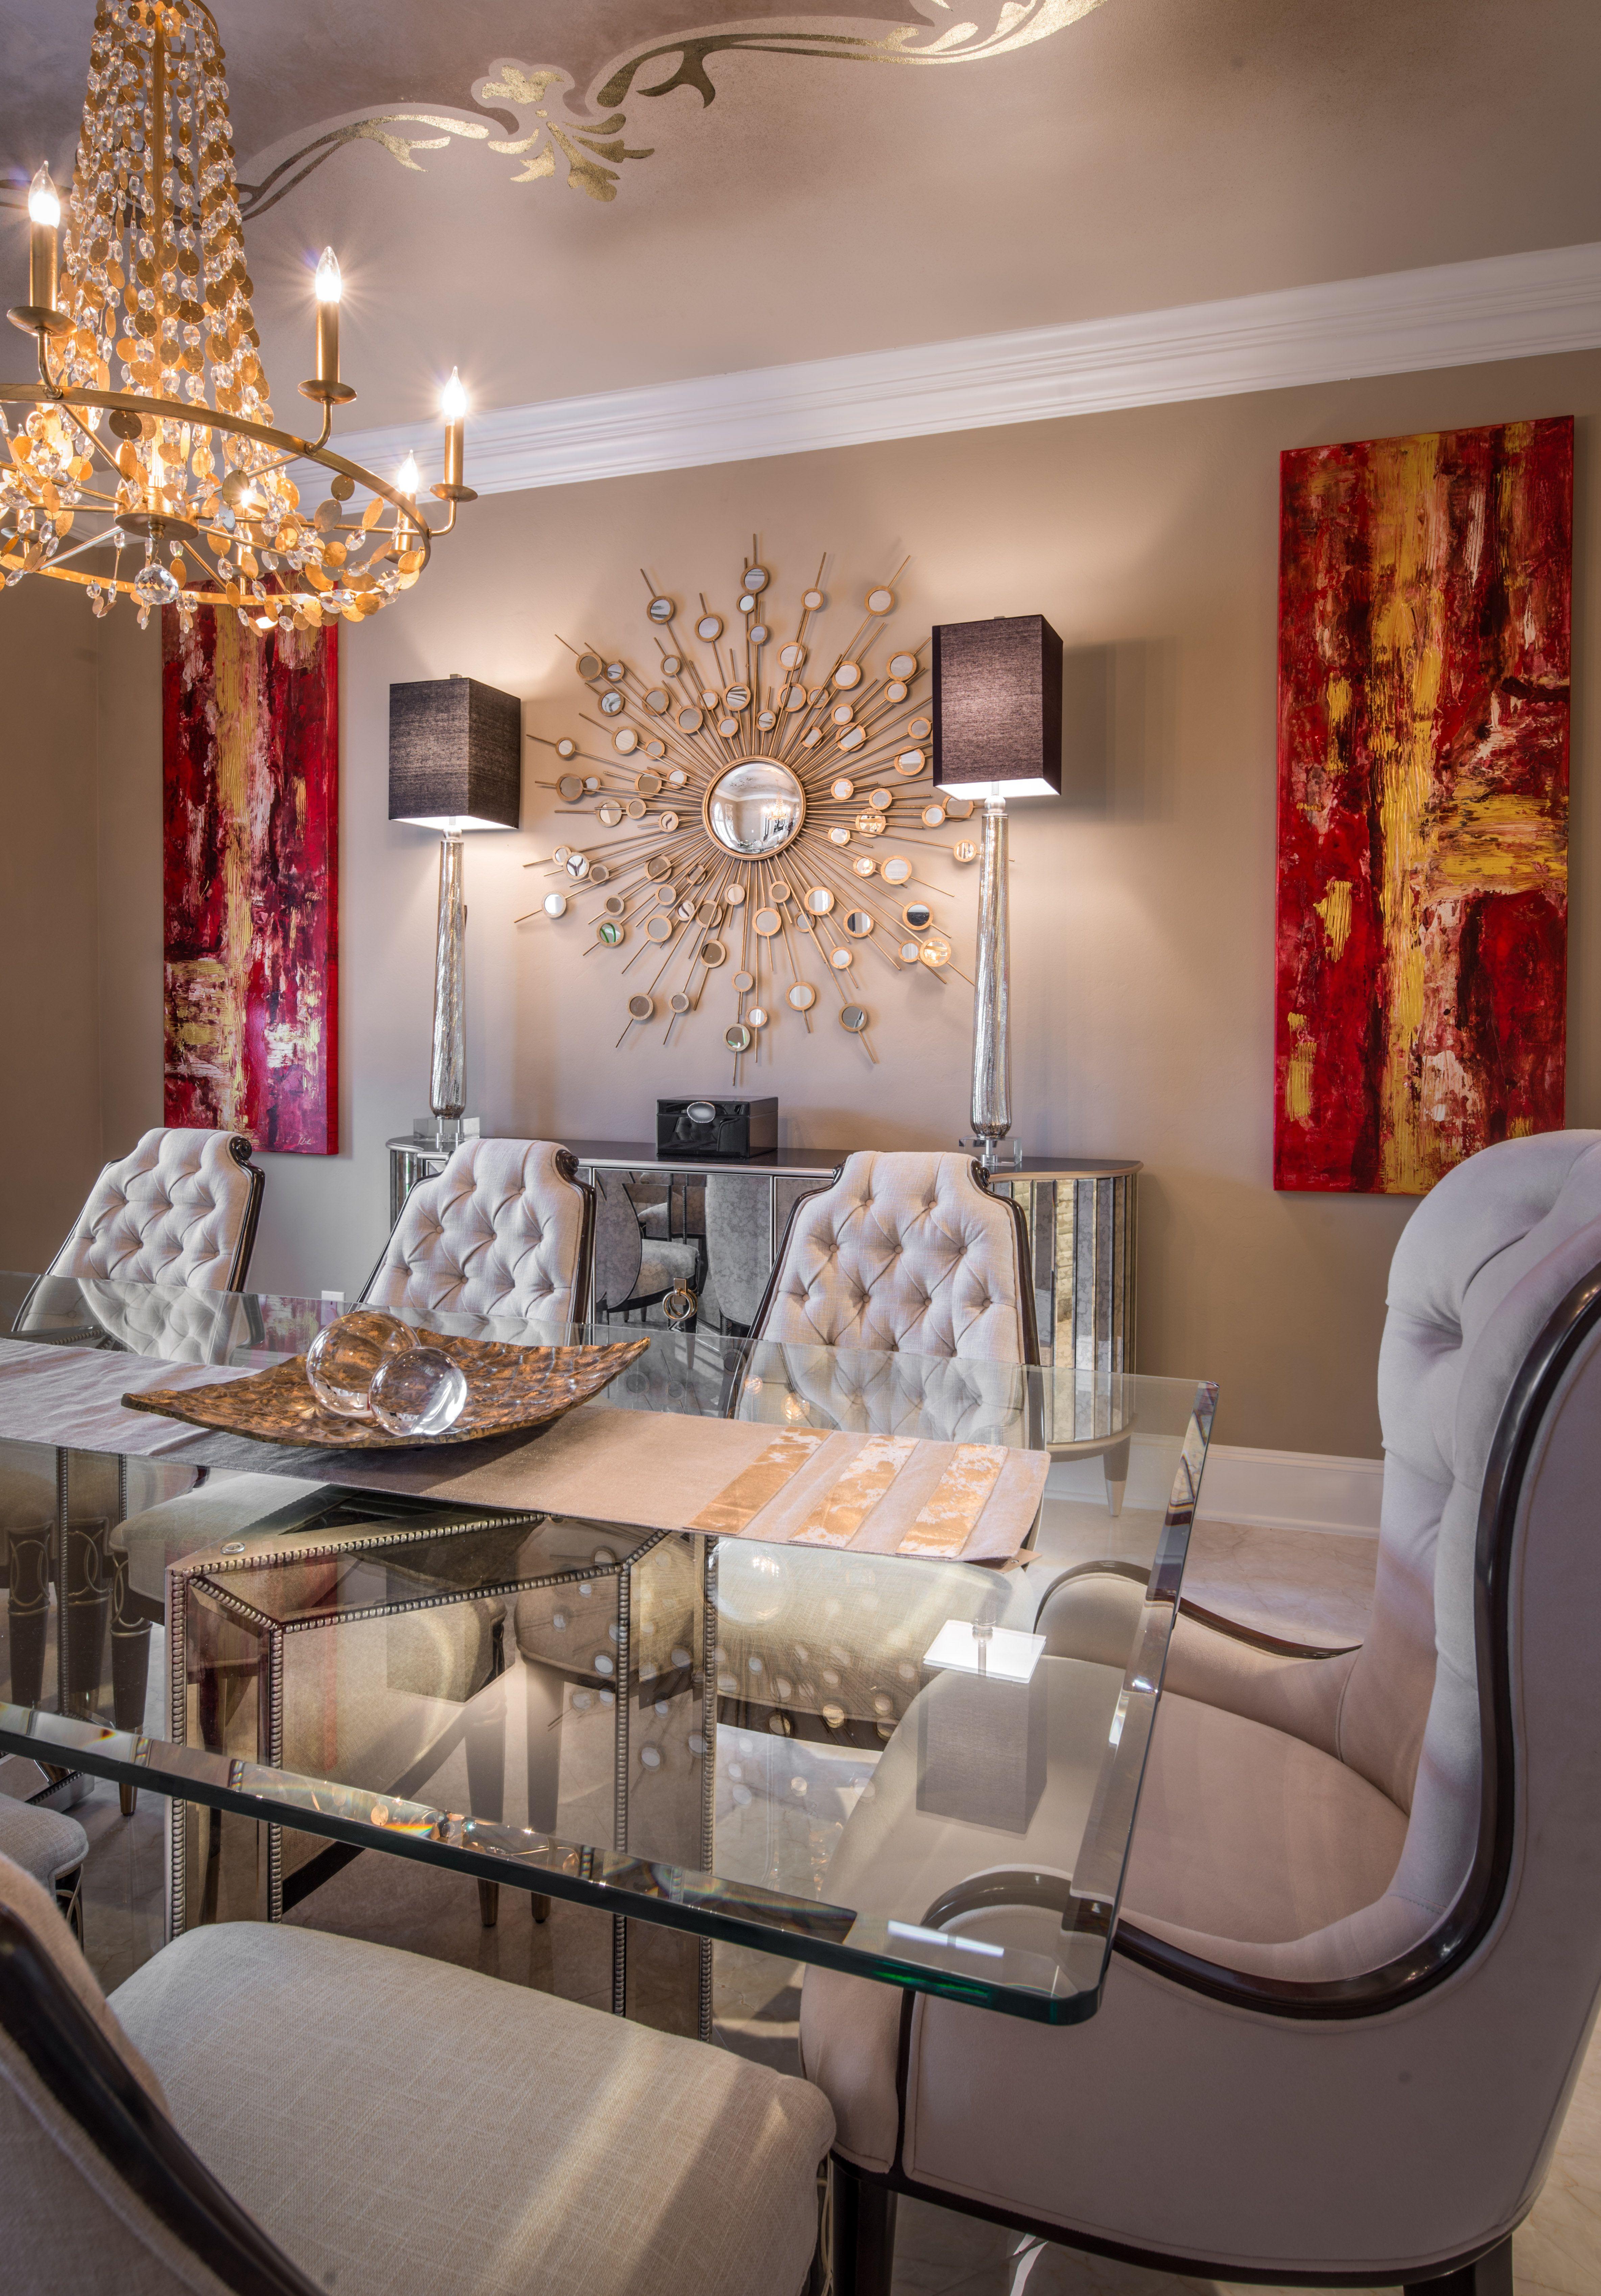 Designed By The Design Firm In Stafford, Texas #interiors  #interiordesignideas #design #